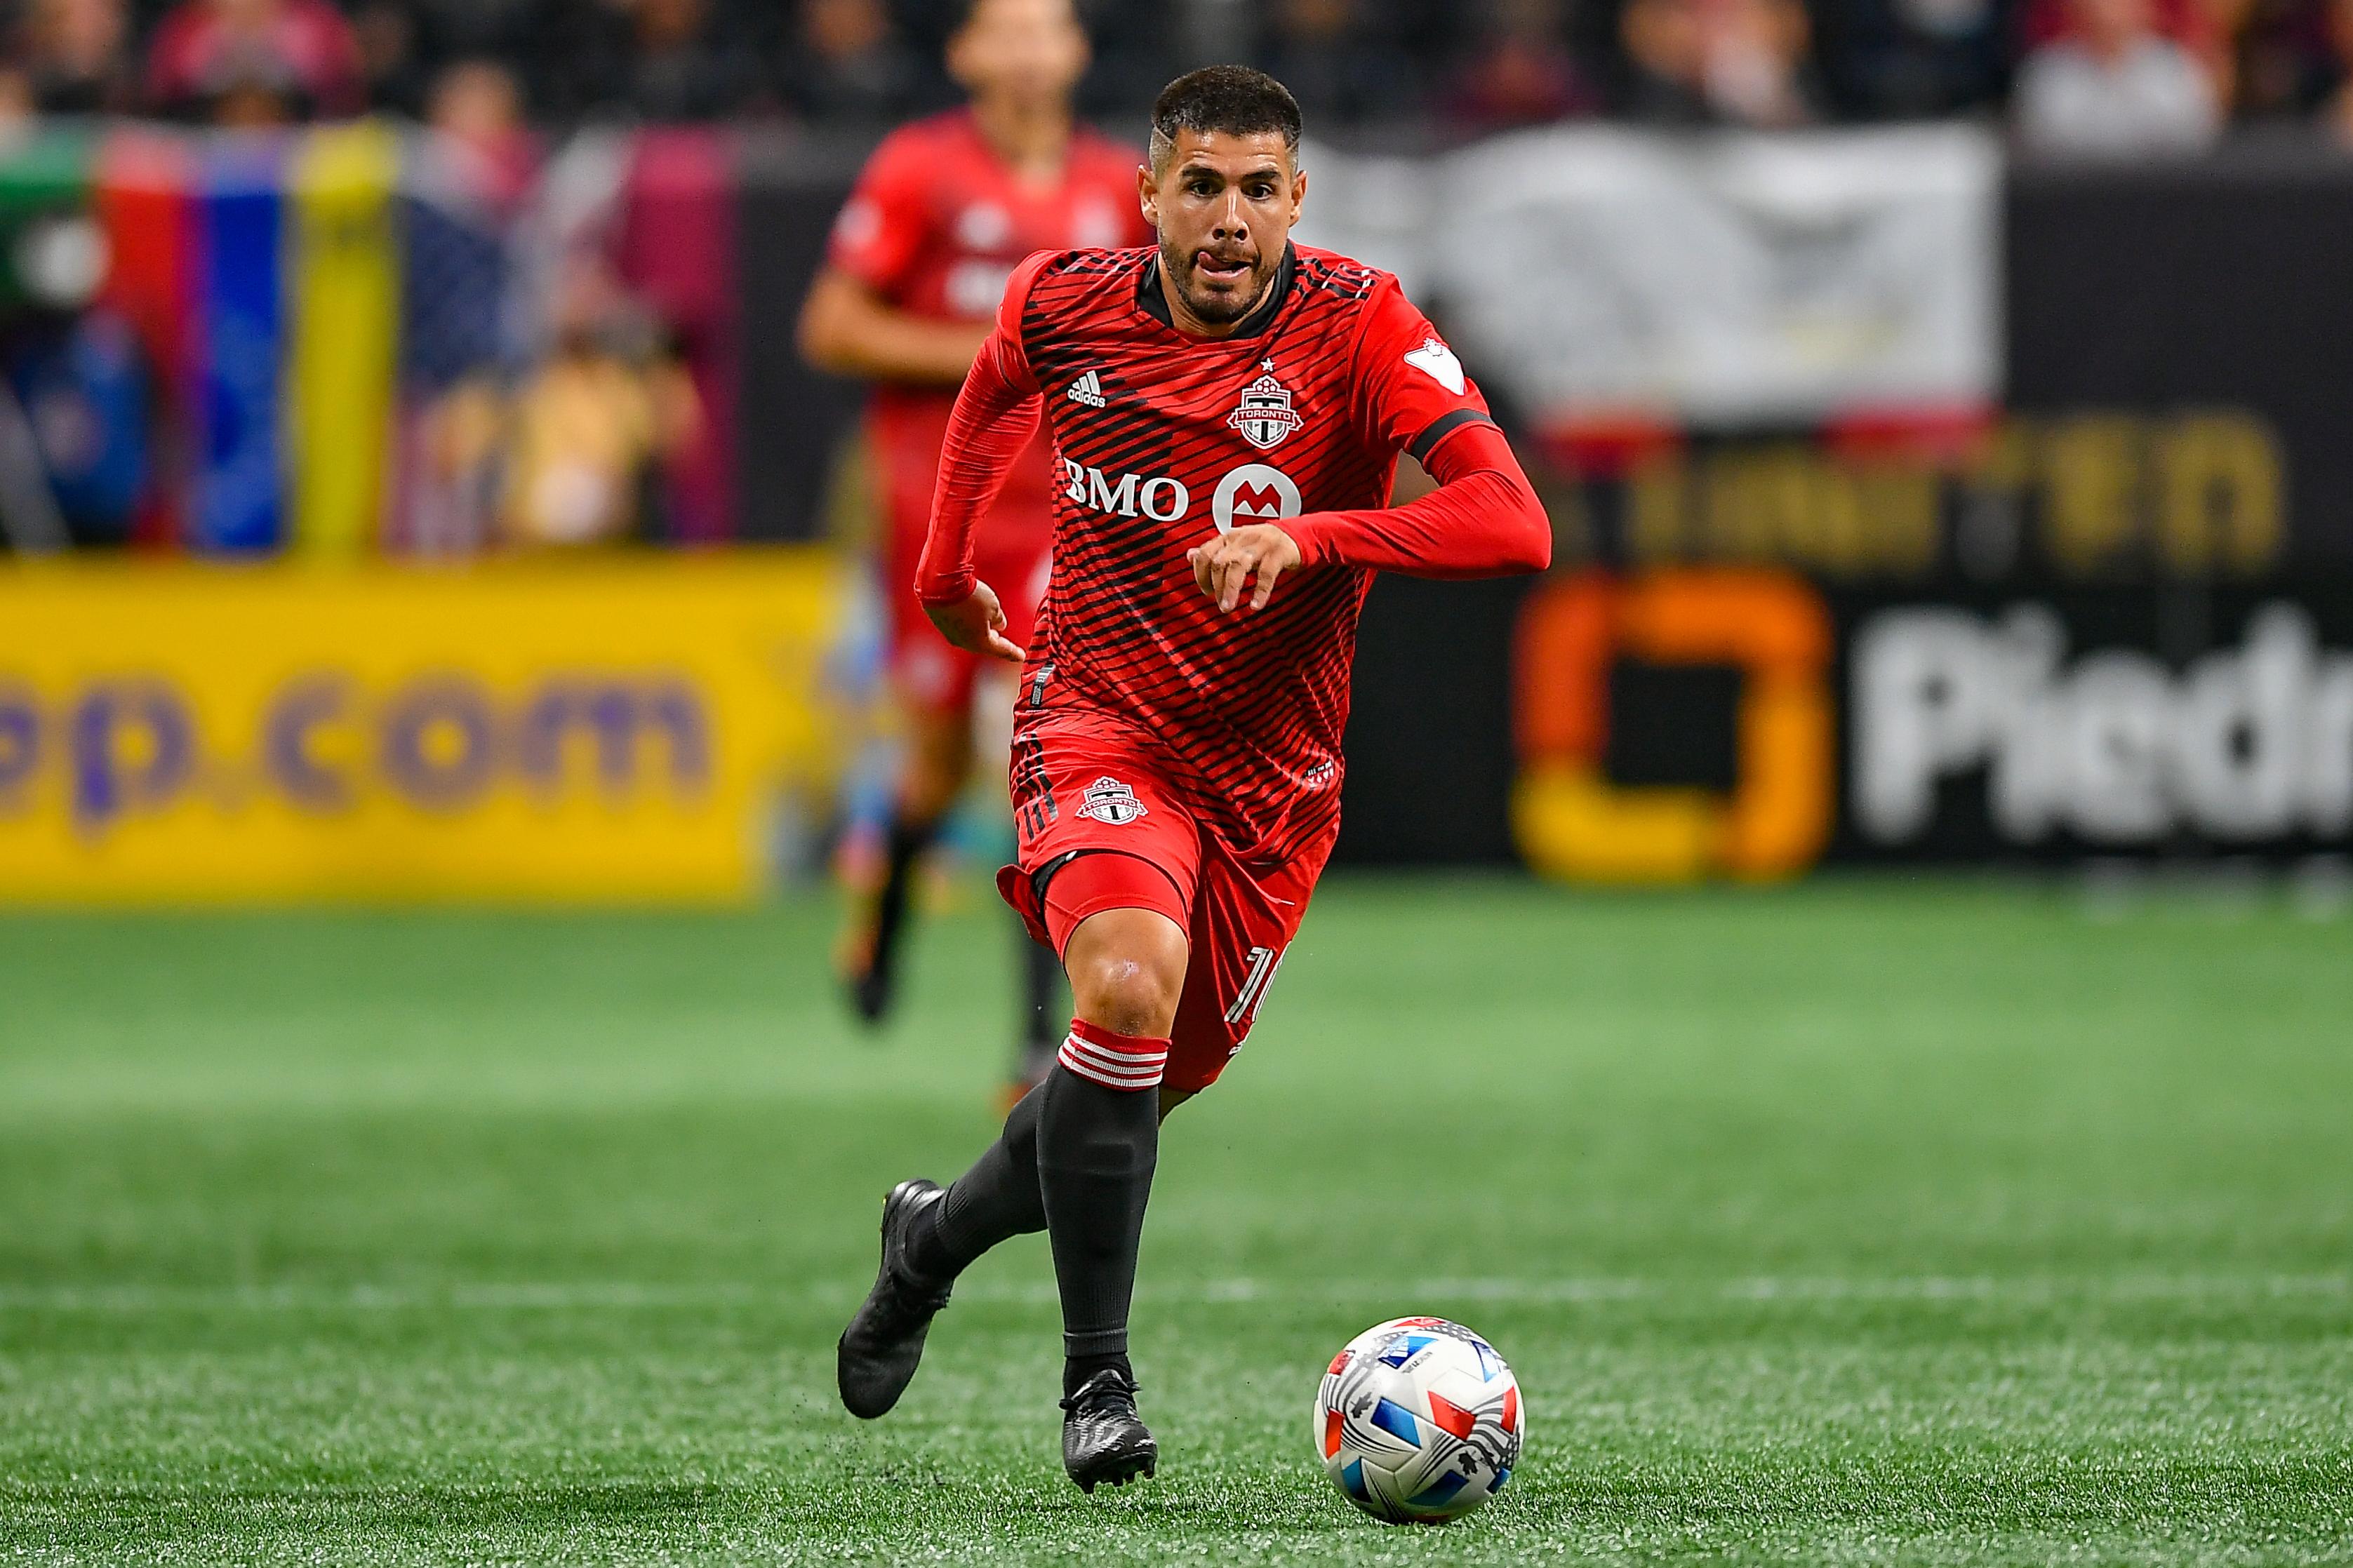 SOCCER: AUG 18 MLS - Toronto FC at Atlanta United FC